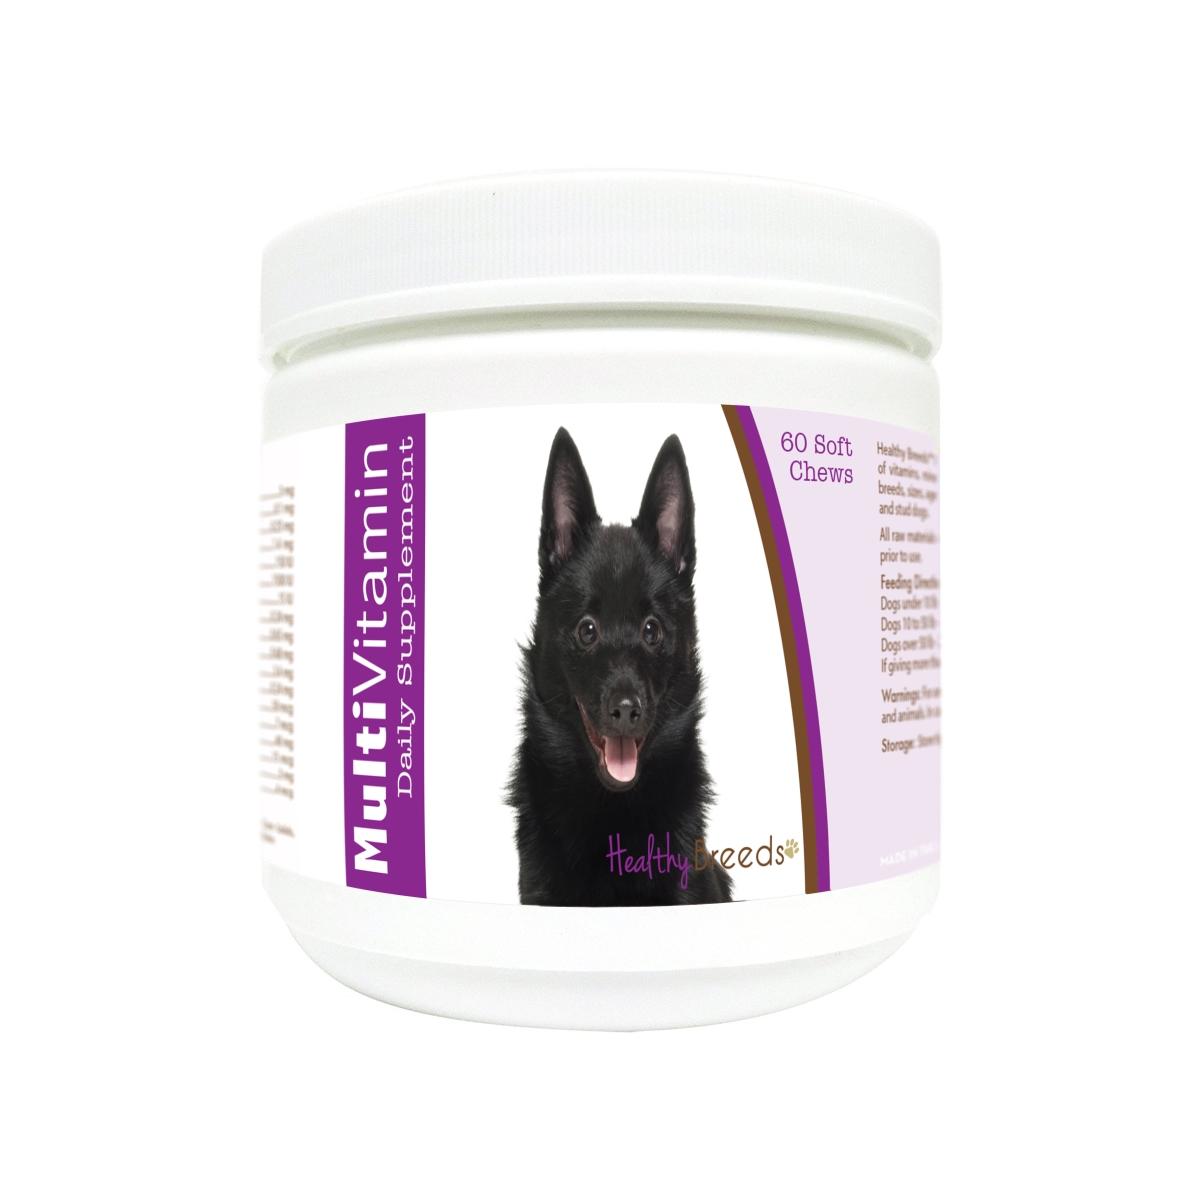 Healthy Breeds 840235173908 Schipperke Multi-Vitamin Soft Chews - 60 Count